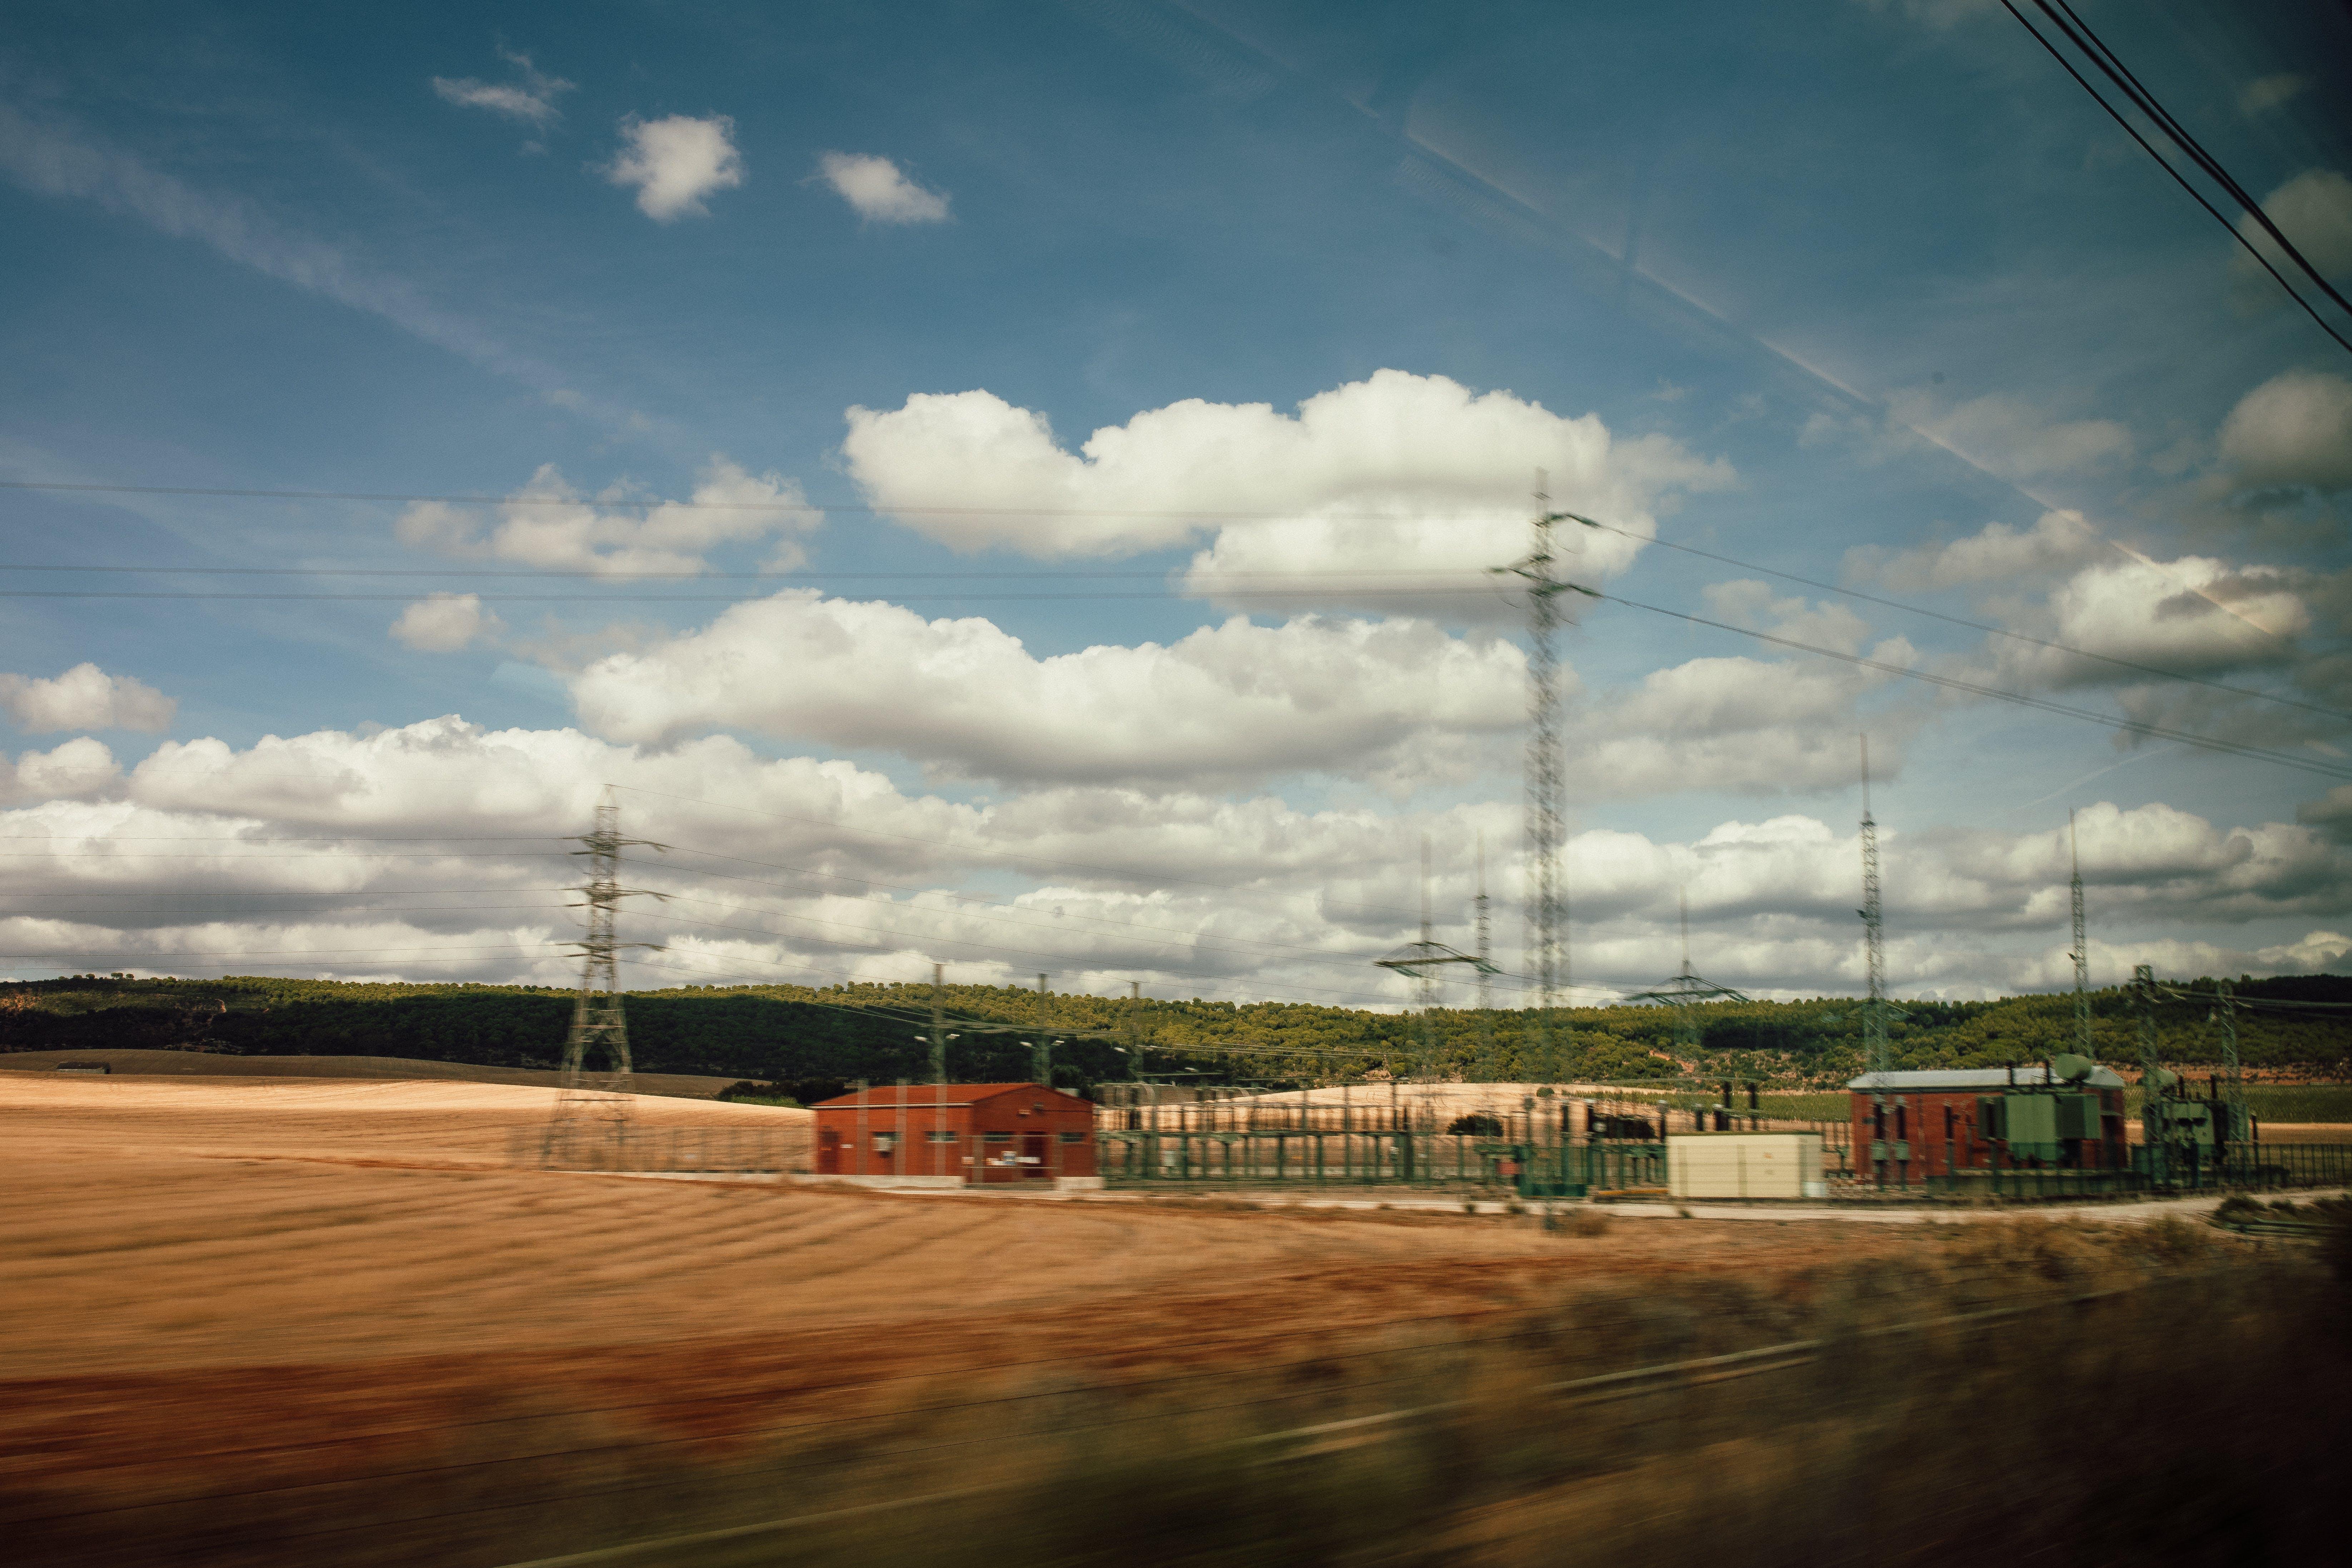 Free stock photo of clouds, train, fast, machine